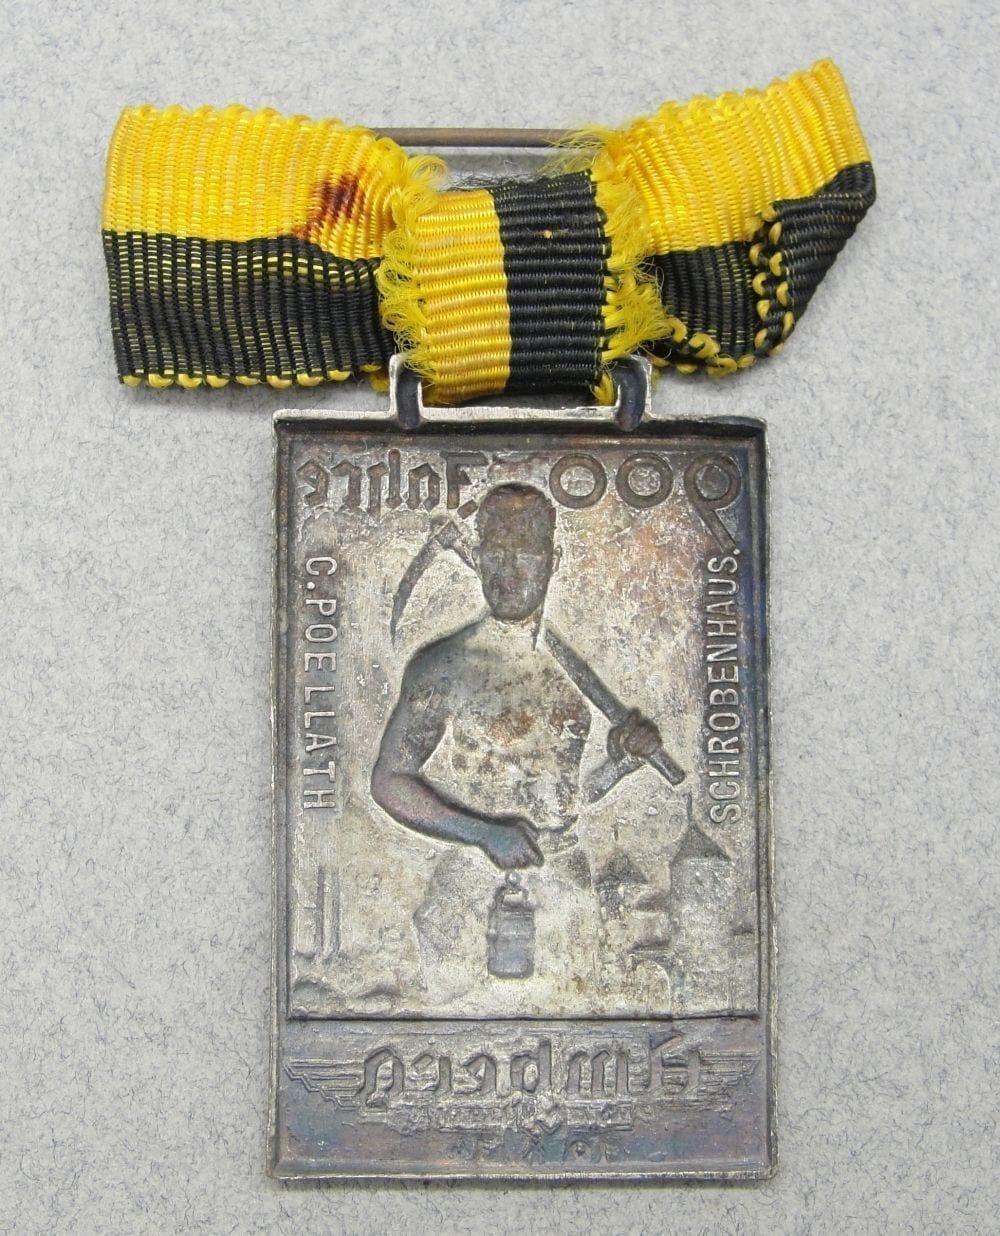 900 Years of Amberg Badge